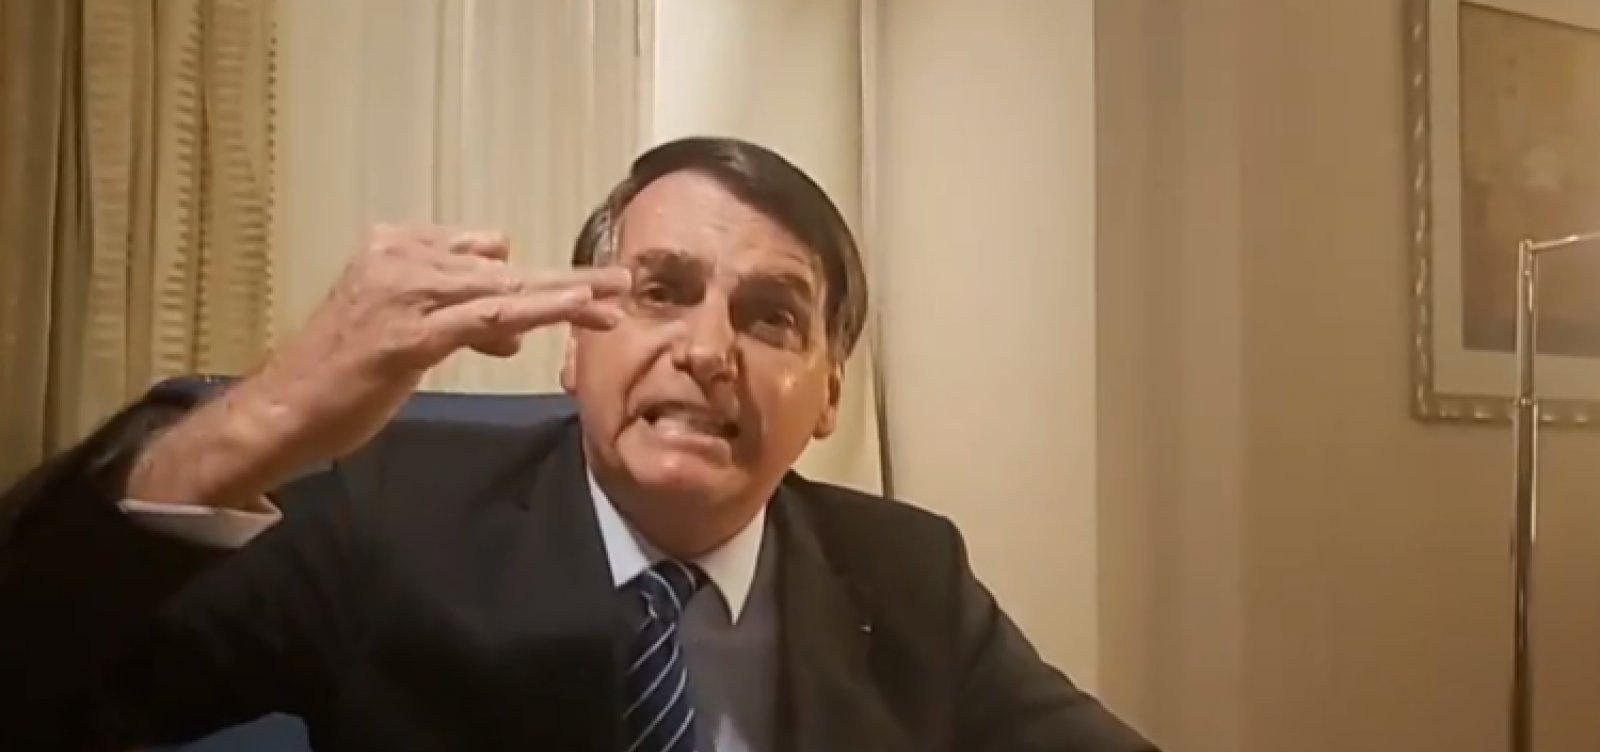 Após matéria do caso Marielle, Bolsonaro ataca Globo e Witzel